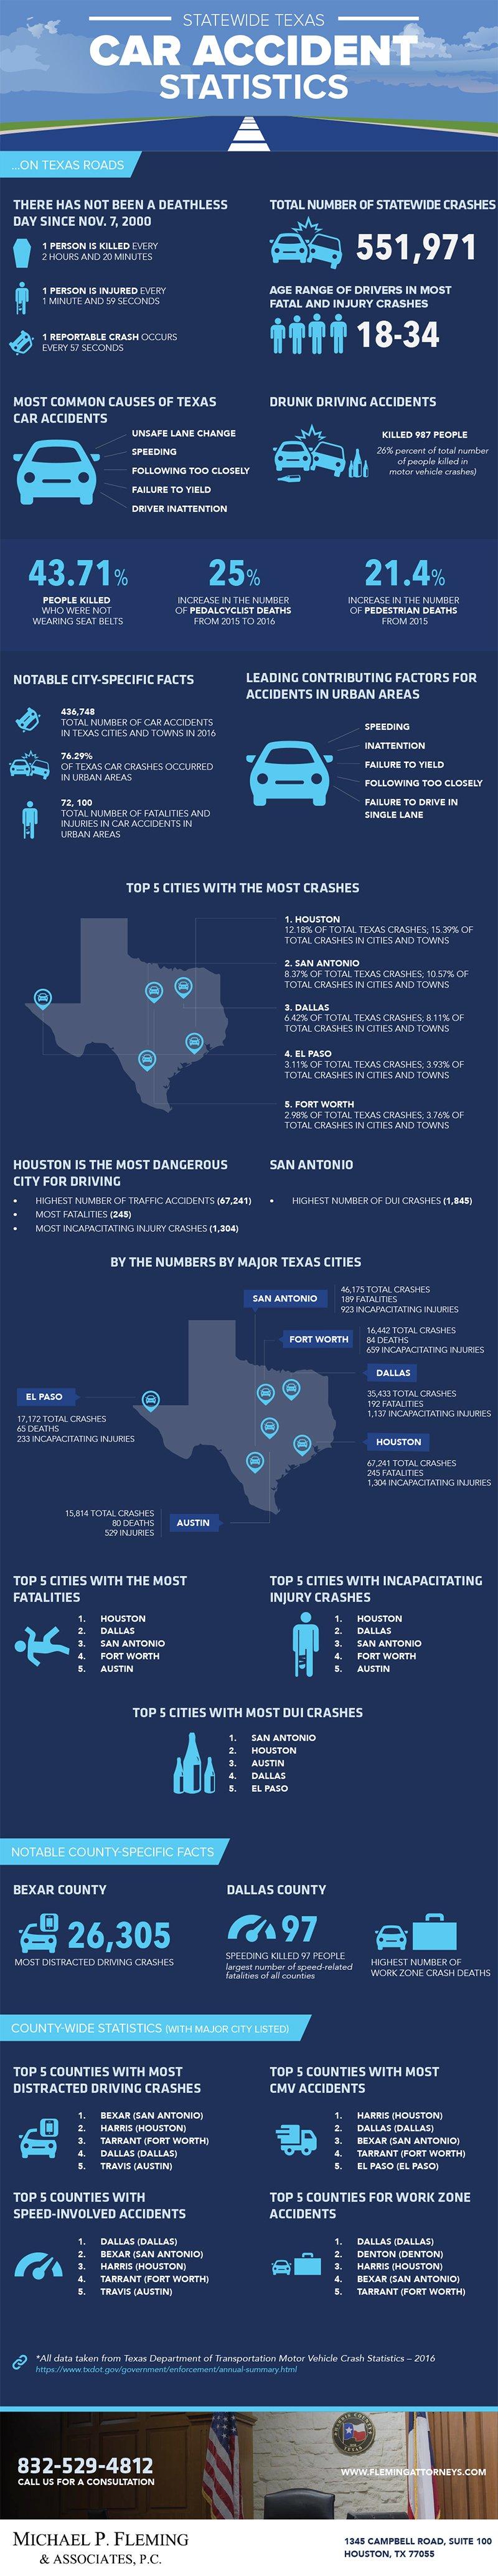 Texas car accident statistics infographic